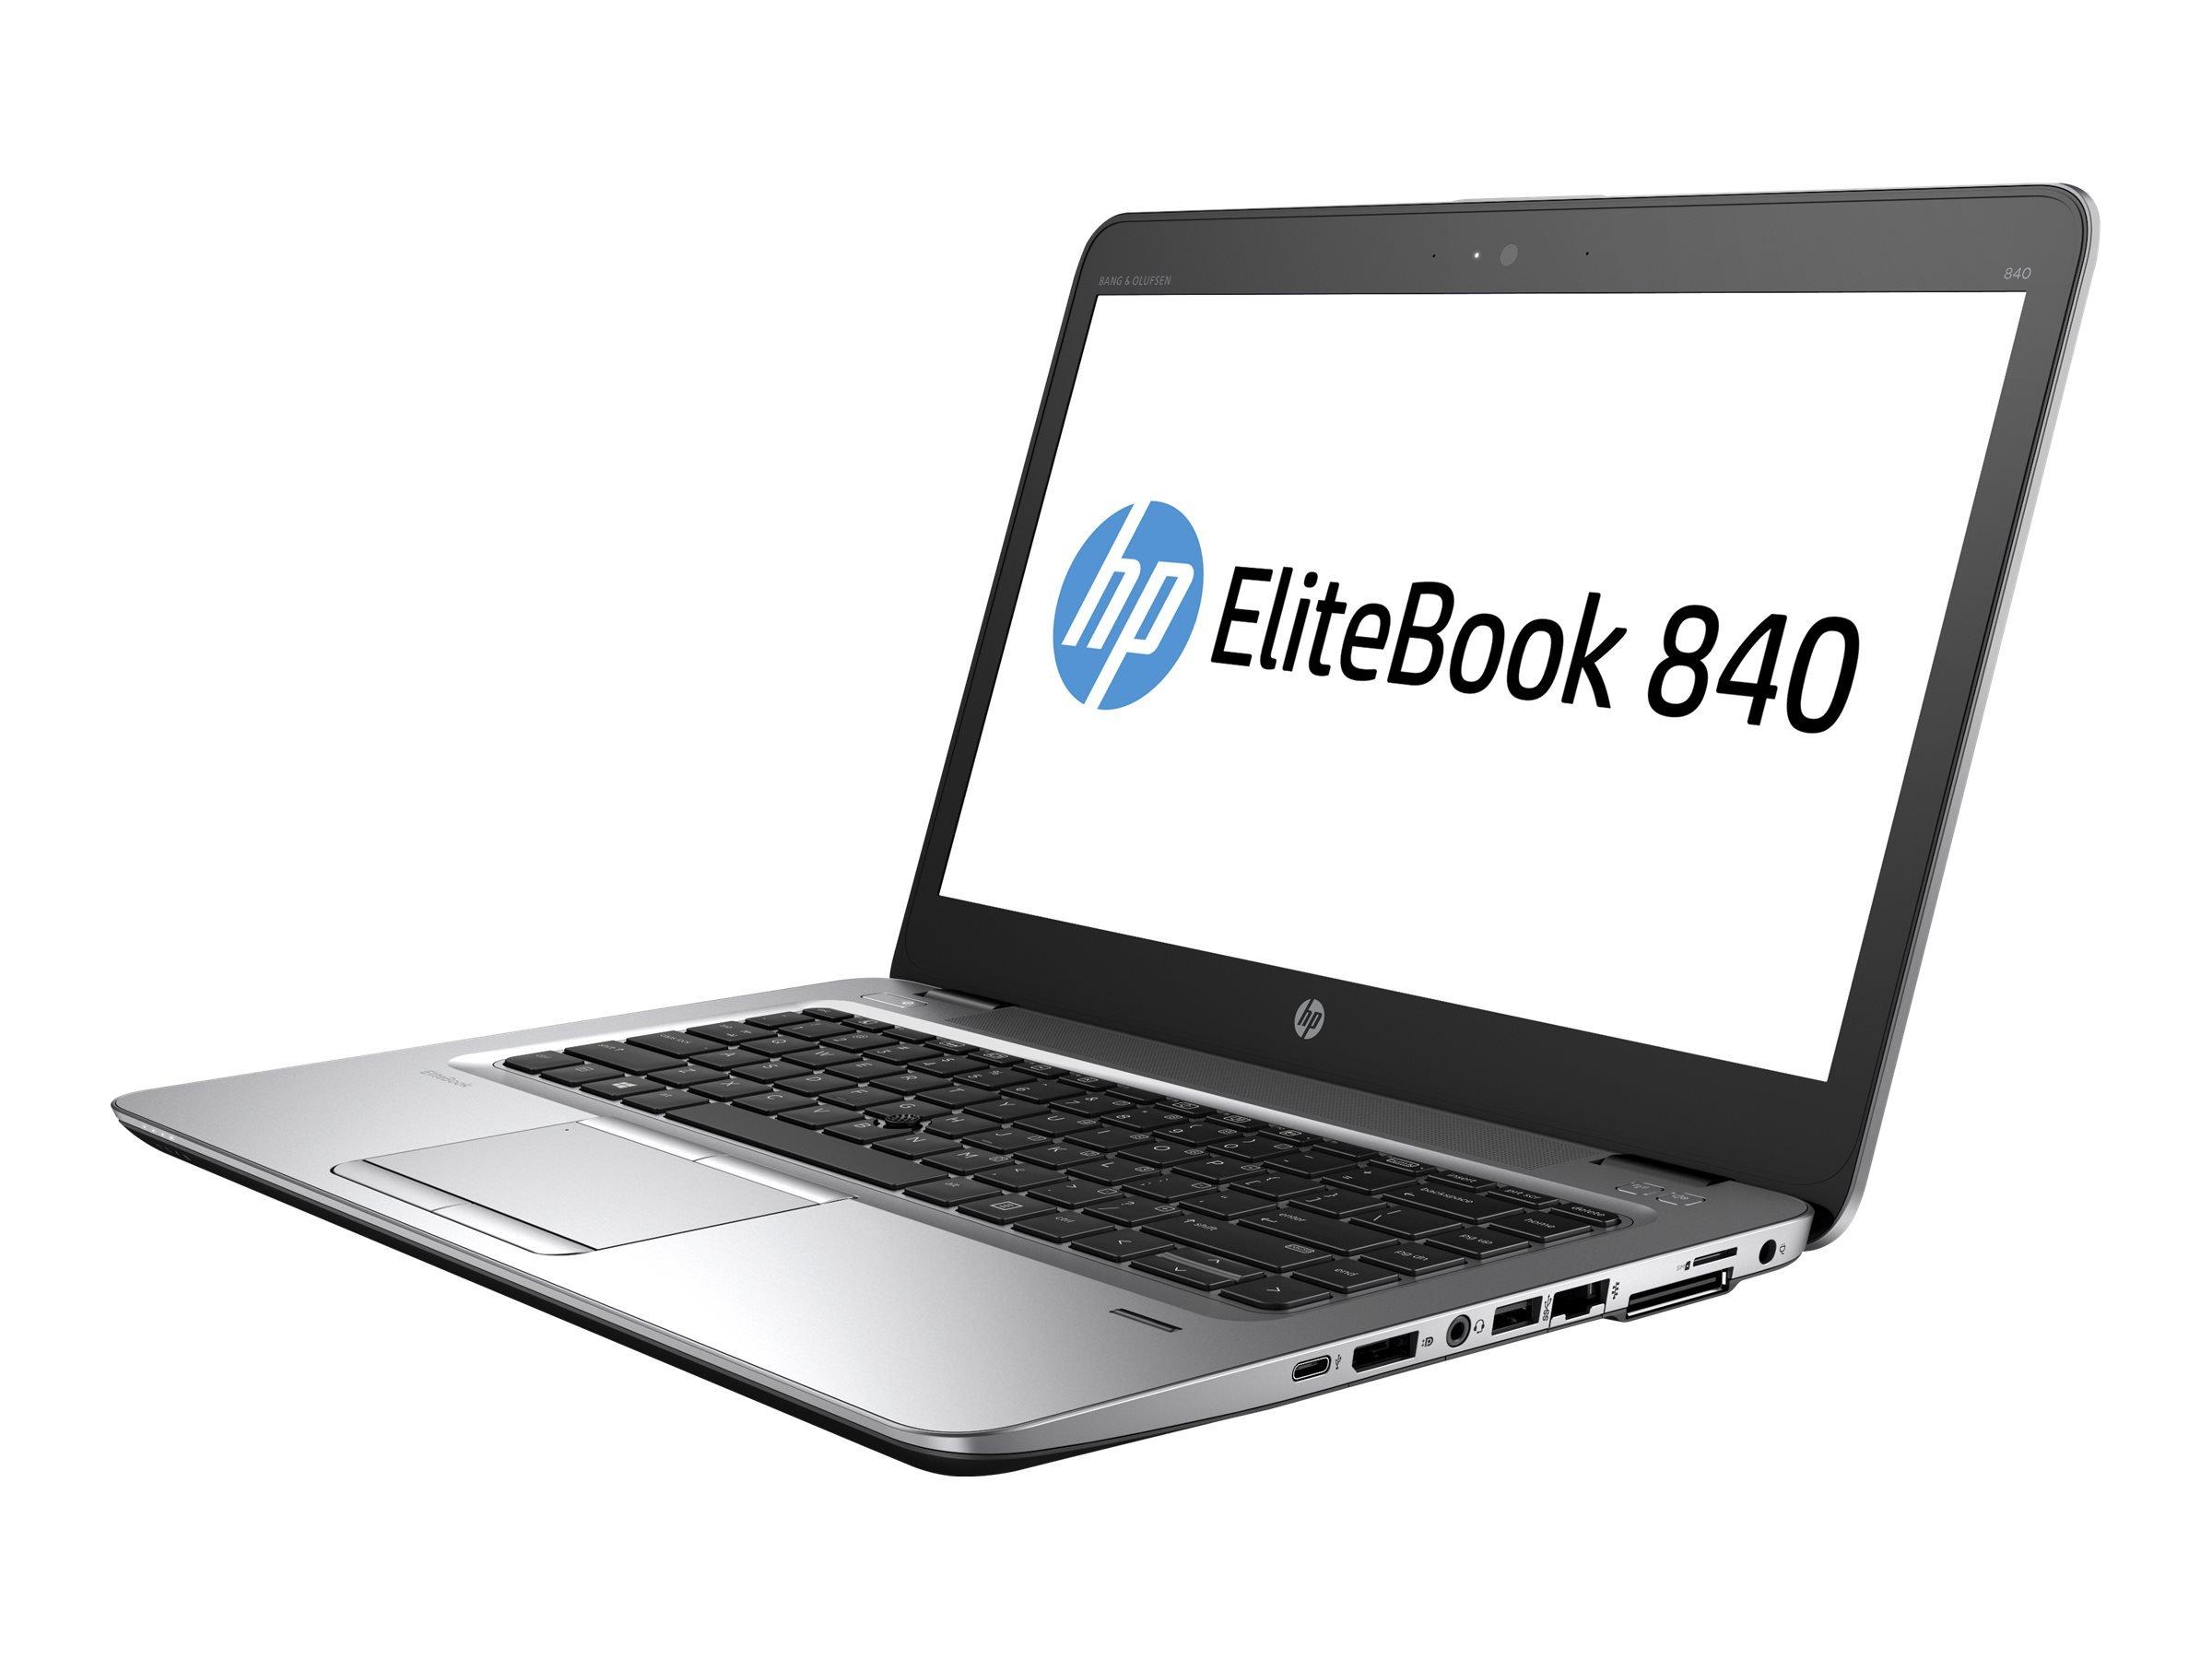 HP T6F47UT#ABA Business 840 i5-6300U 14.0'' 8GB 500 7/1 Laptop